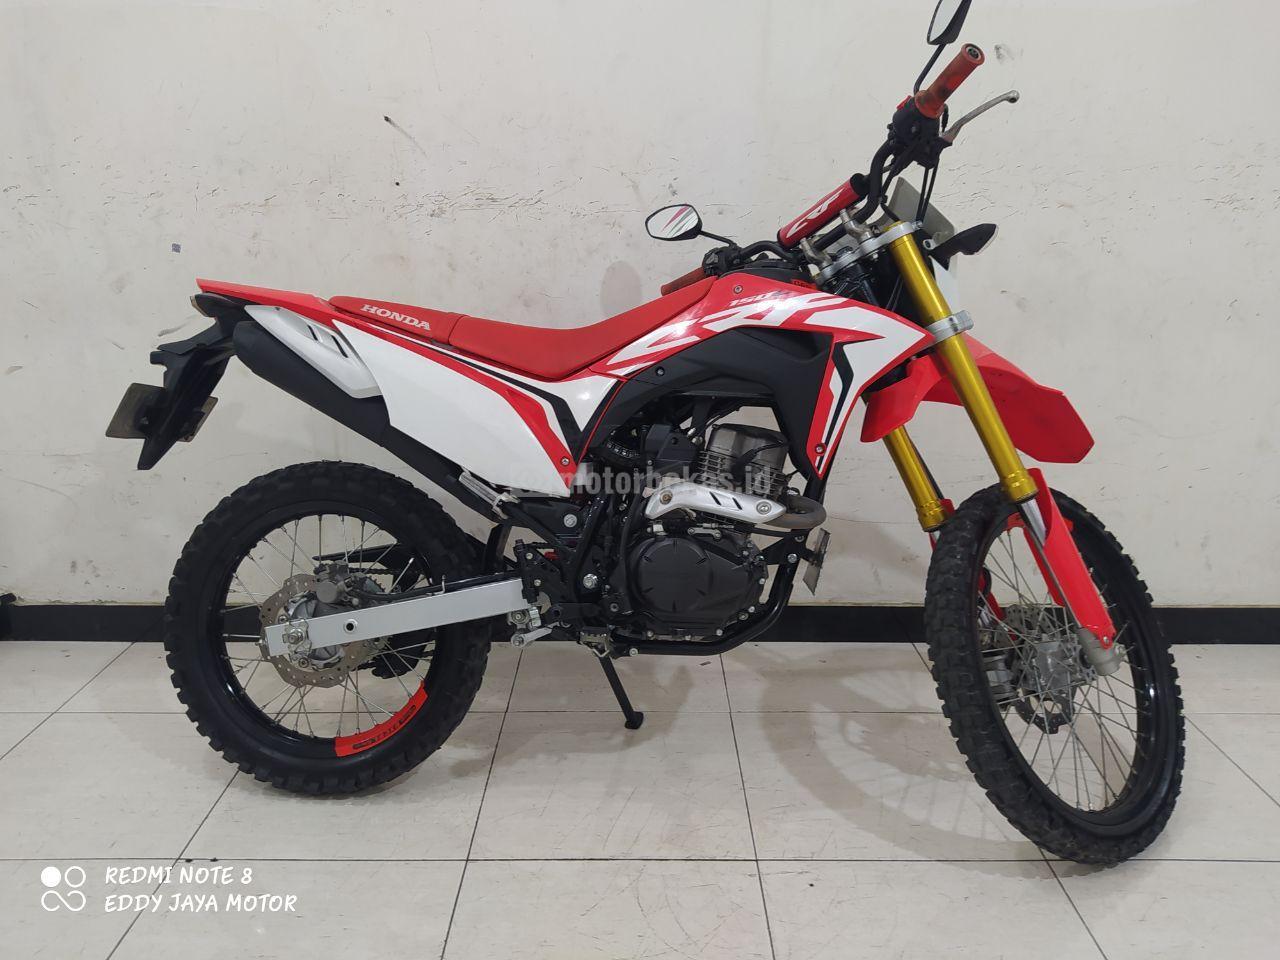 HONDA CRF 150L  1621 motorbekas.id